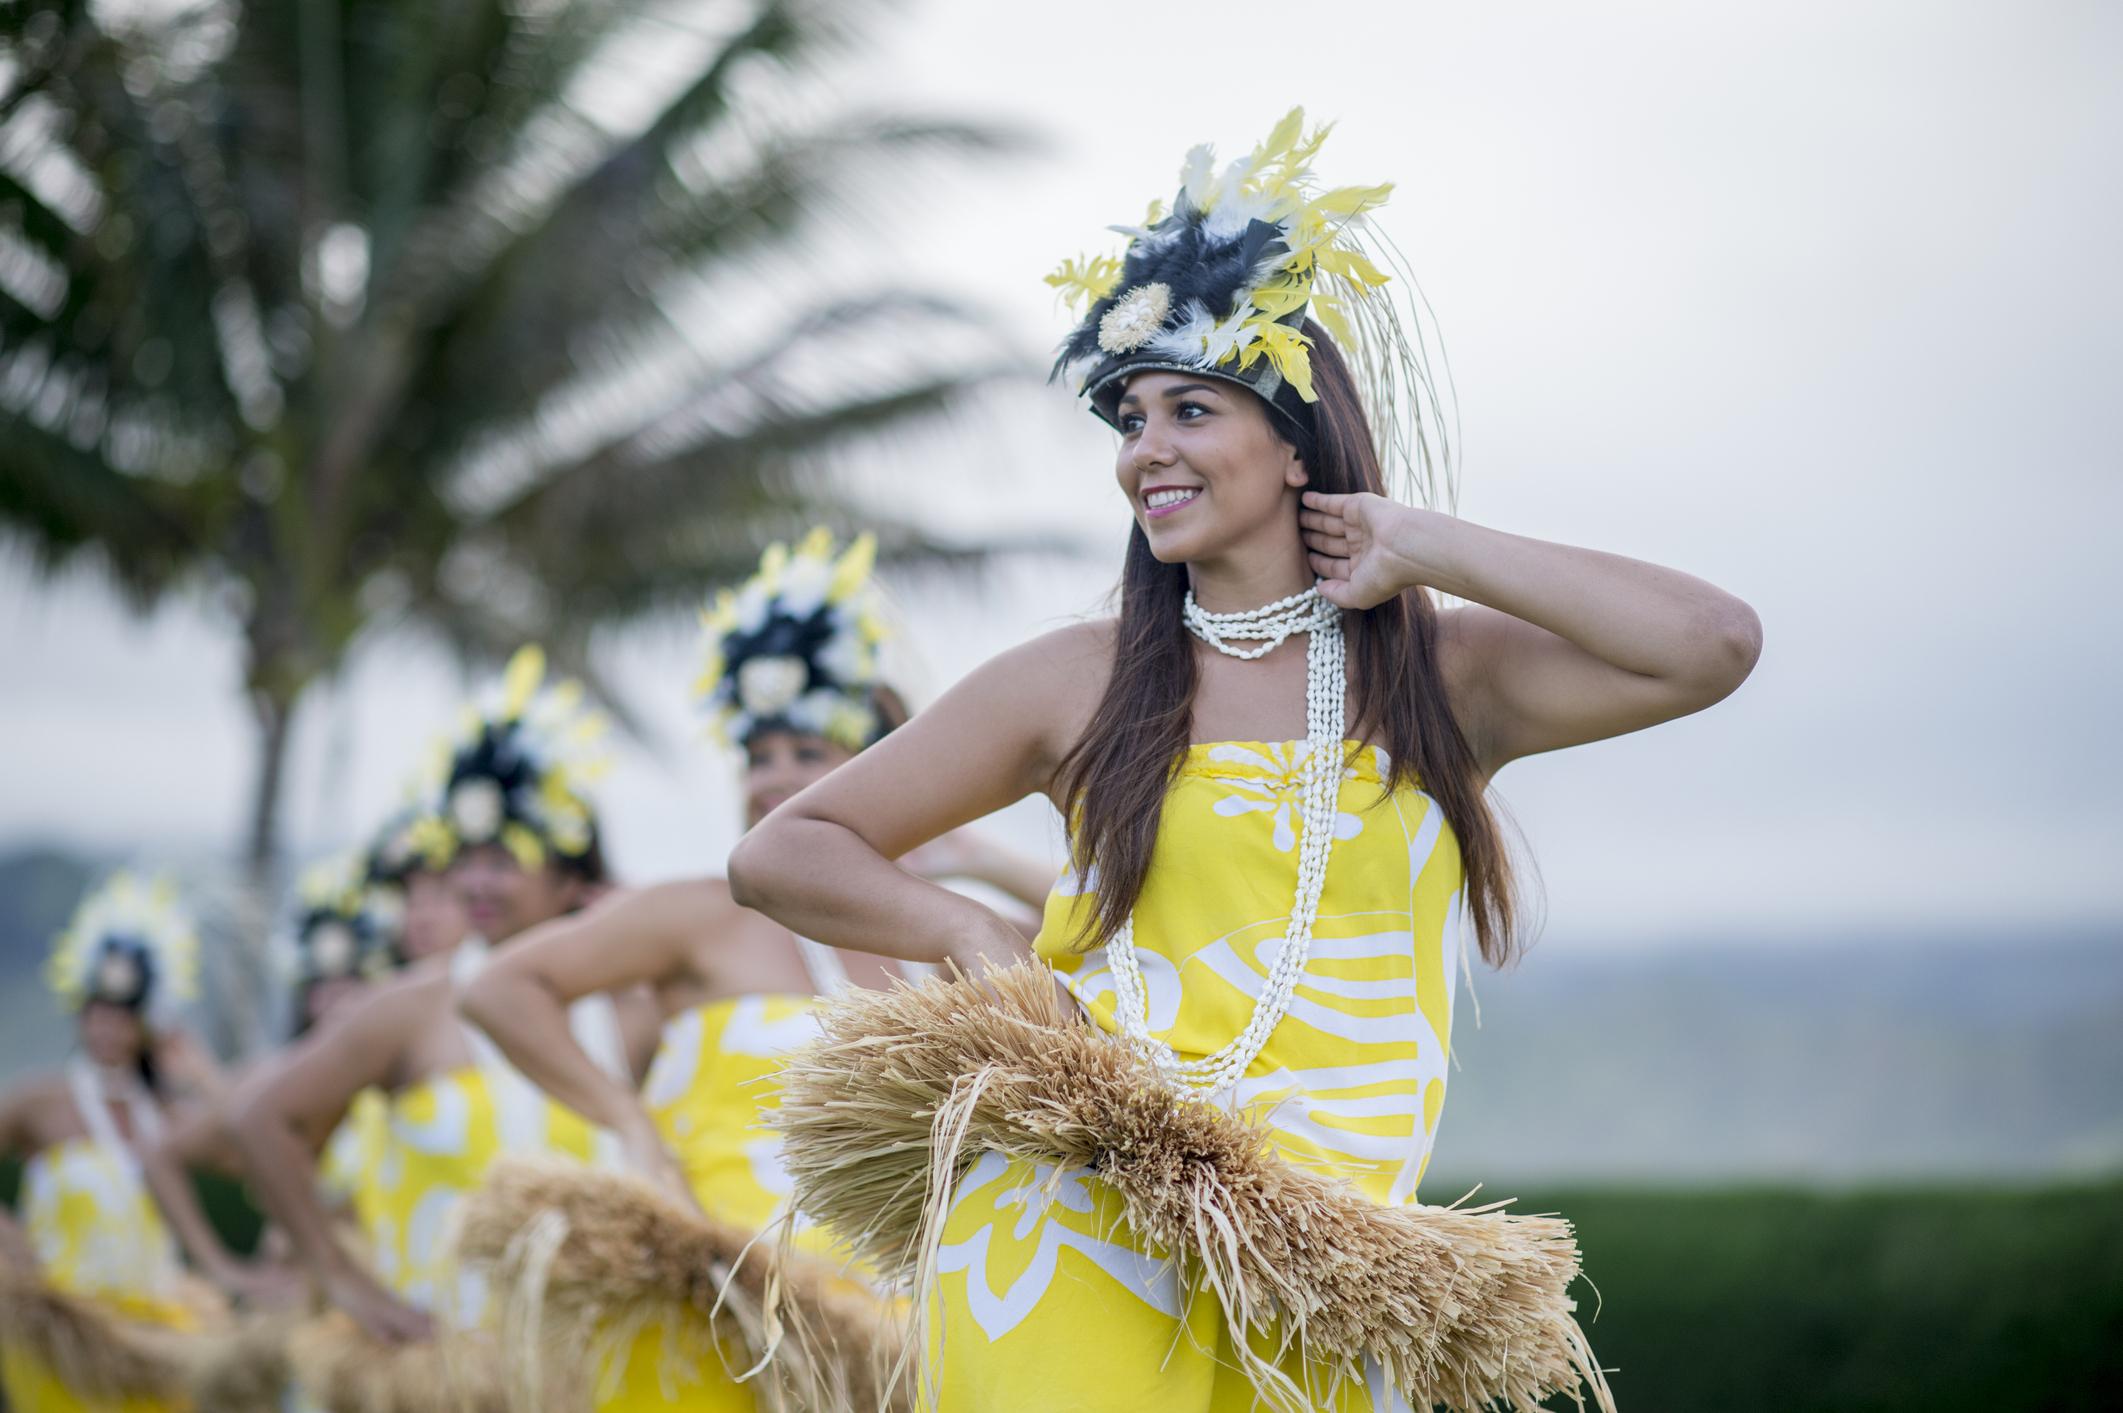 Woman Leading The Luau Performance